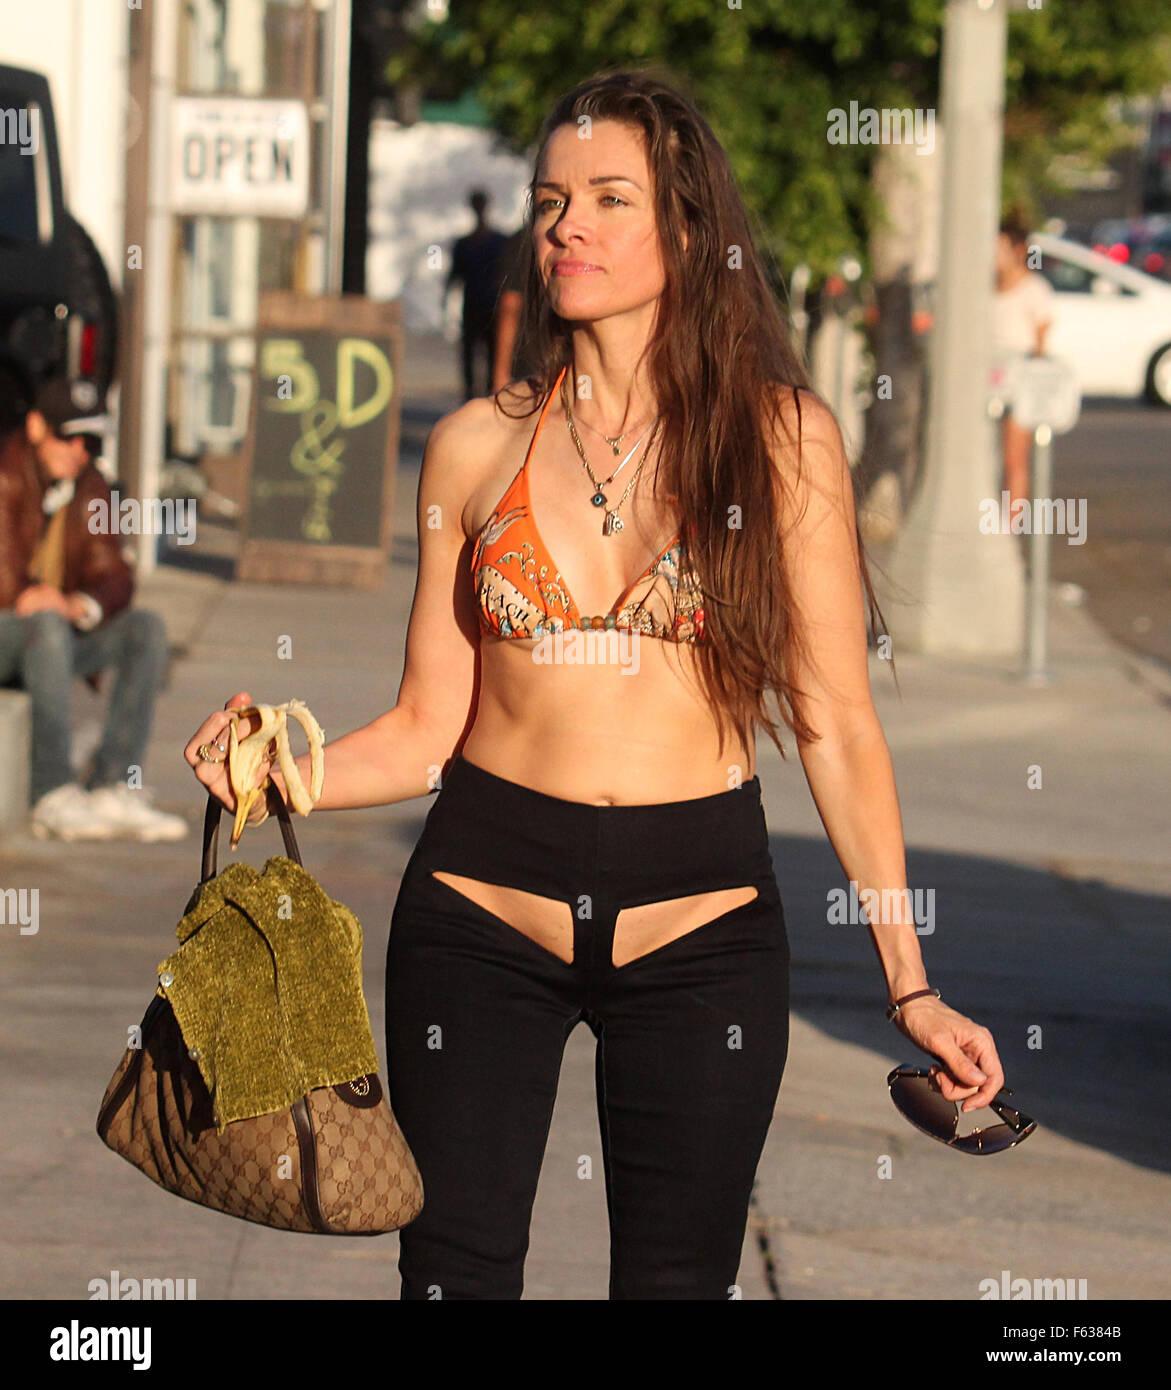 Pictures Saraya-Jade Rodriguez nude (99 photo), Ass, Is a cute, Feet, in bikini 2019